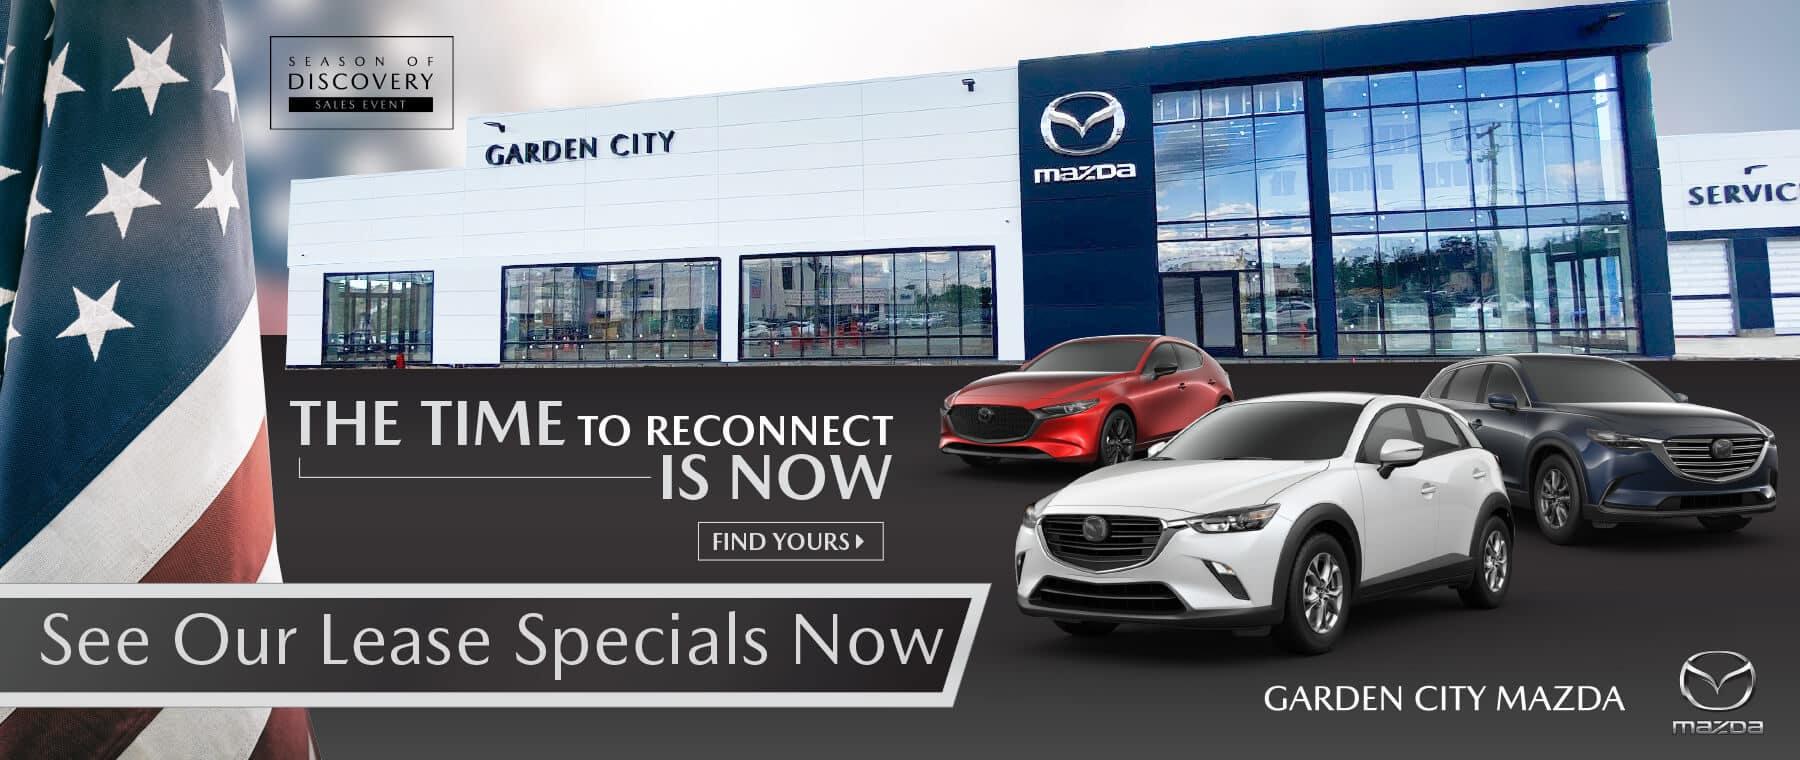 2021.06.25_Garden-City-Mazda-July-Web_S52901ll-1